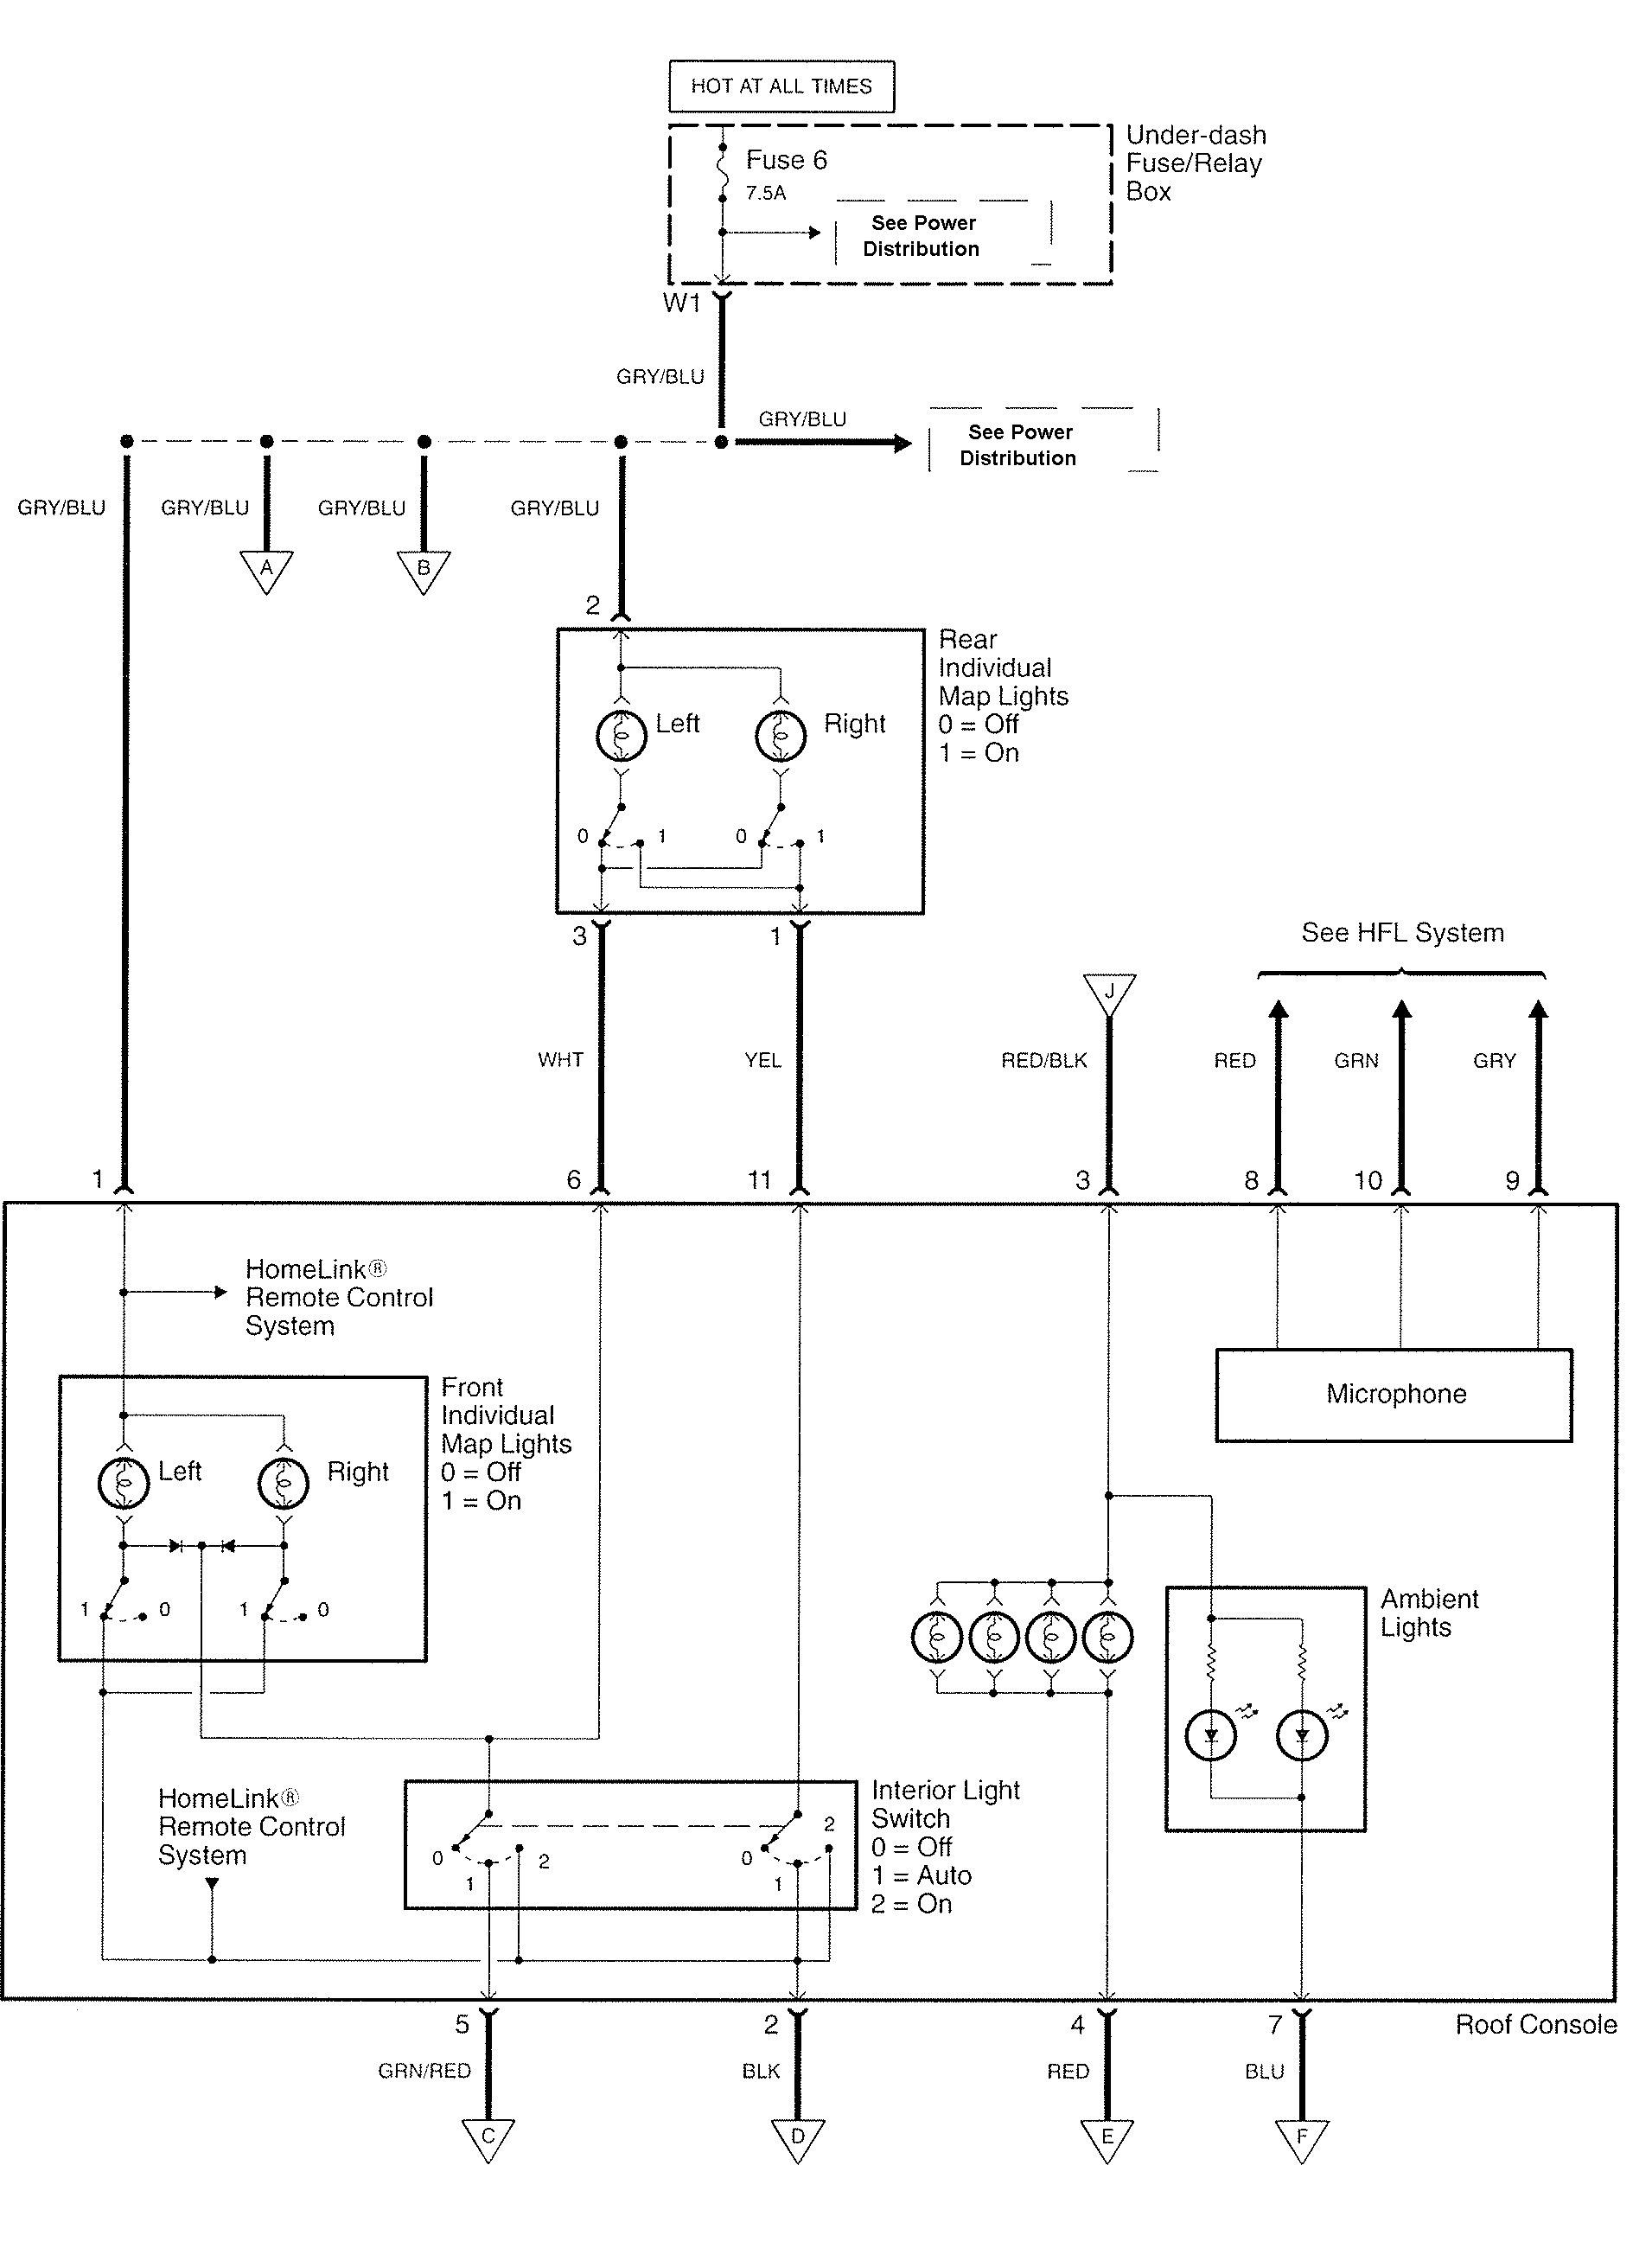 2007 acura tl wiring diagram wiring diagram schematic2007 acura tl wiring diagram acura mdx remote start 2007 acura tl wiring diagram